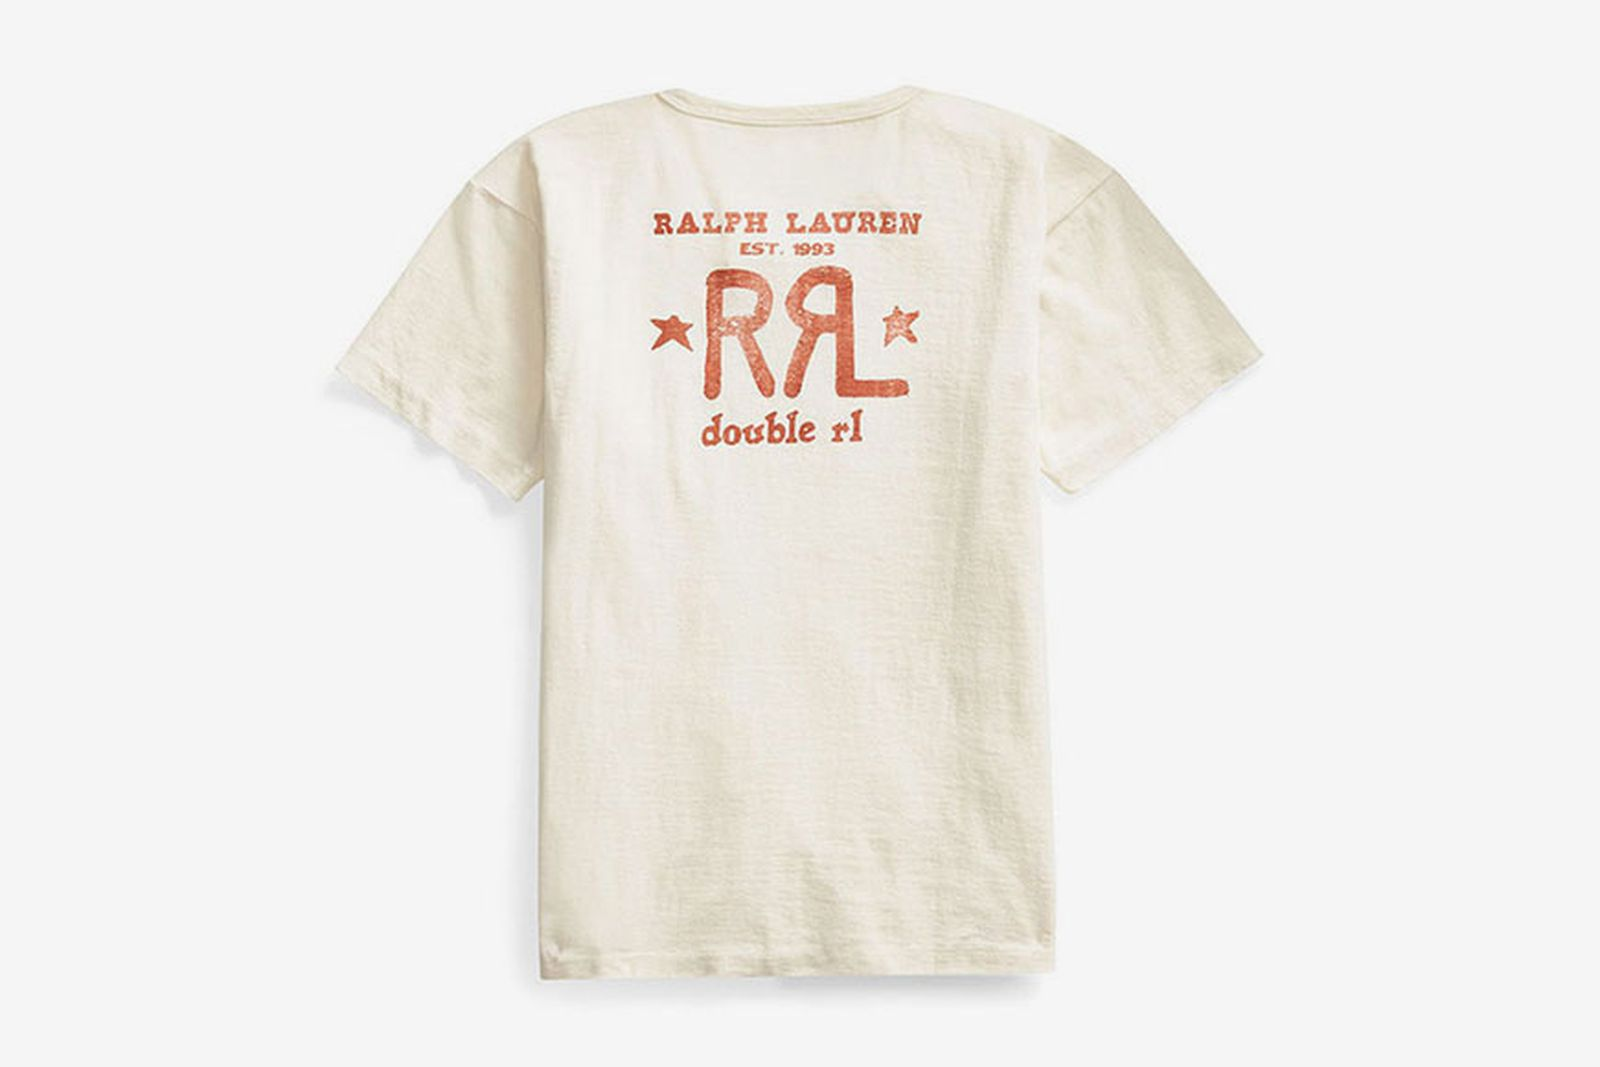 ralph lauren rrl 25th anniversary collection